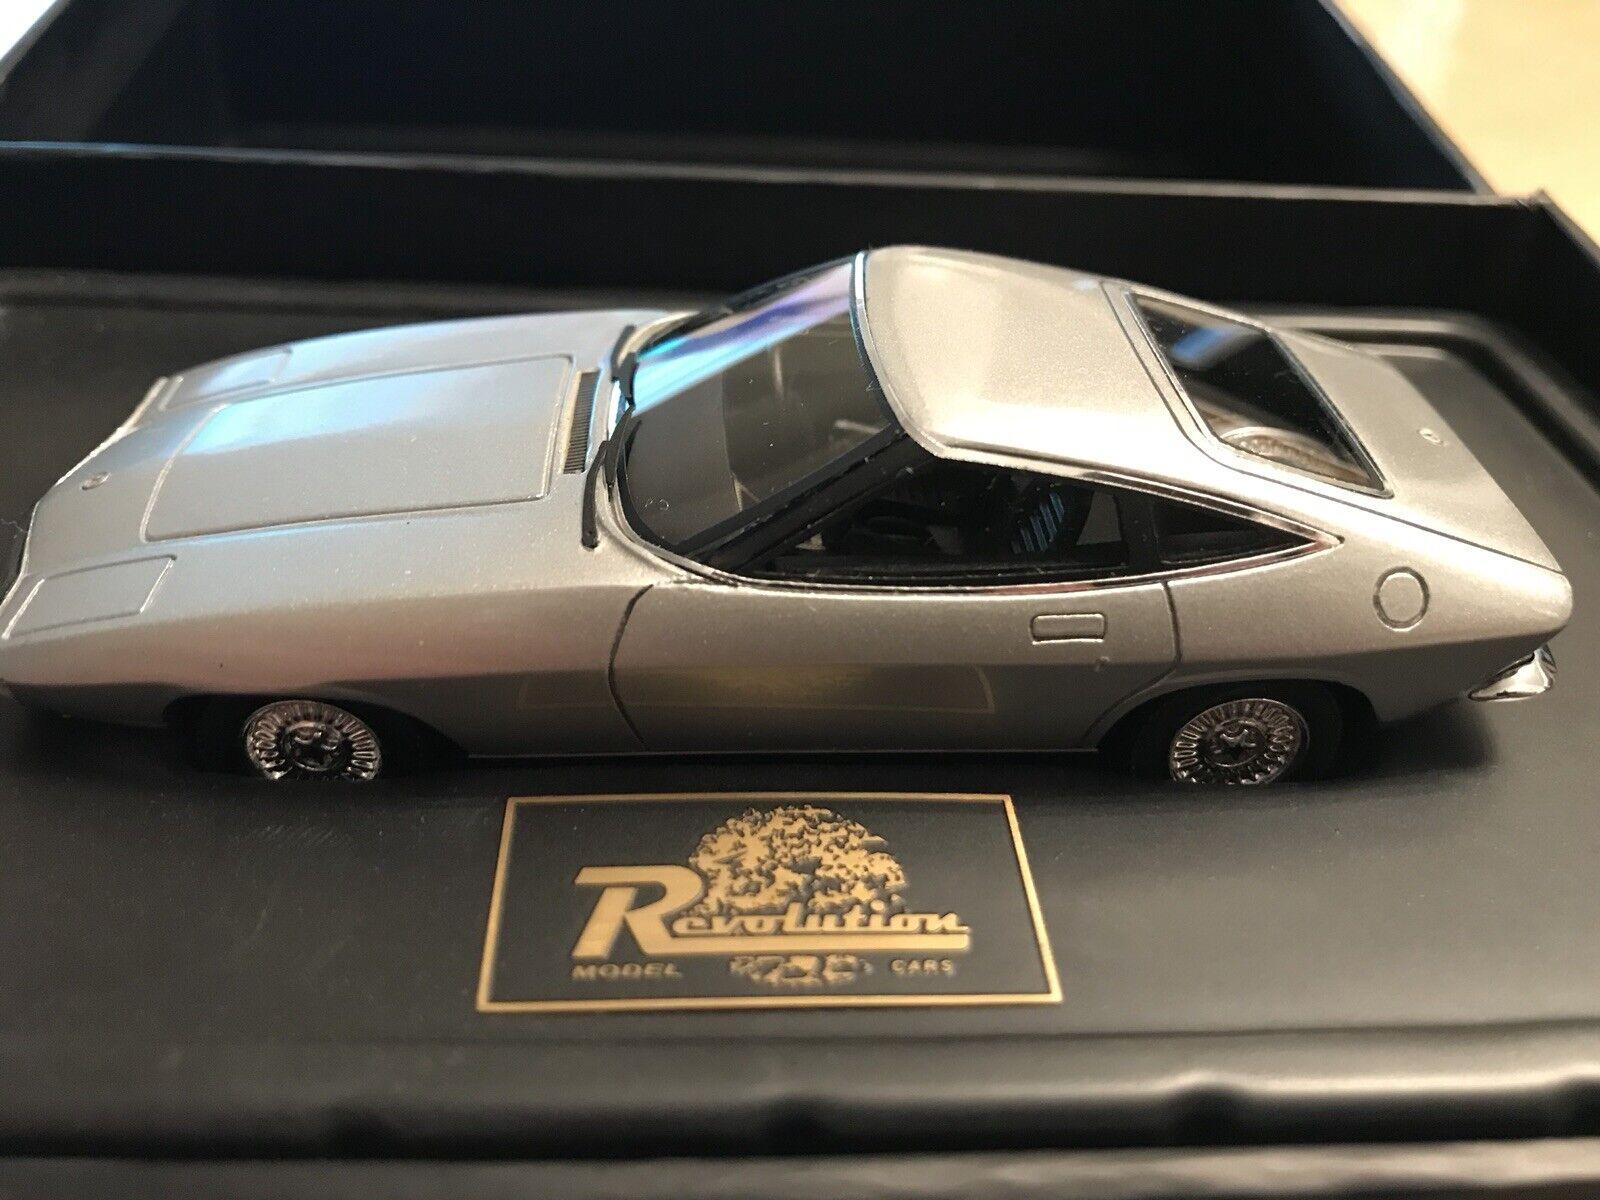 REVOLUTION MODEL CARS GTR-X TORANA CONCEPT 1 43 ONLY 500 MADE